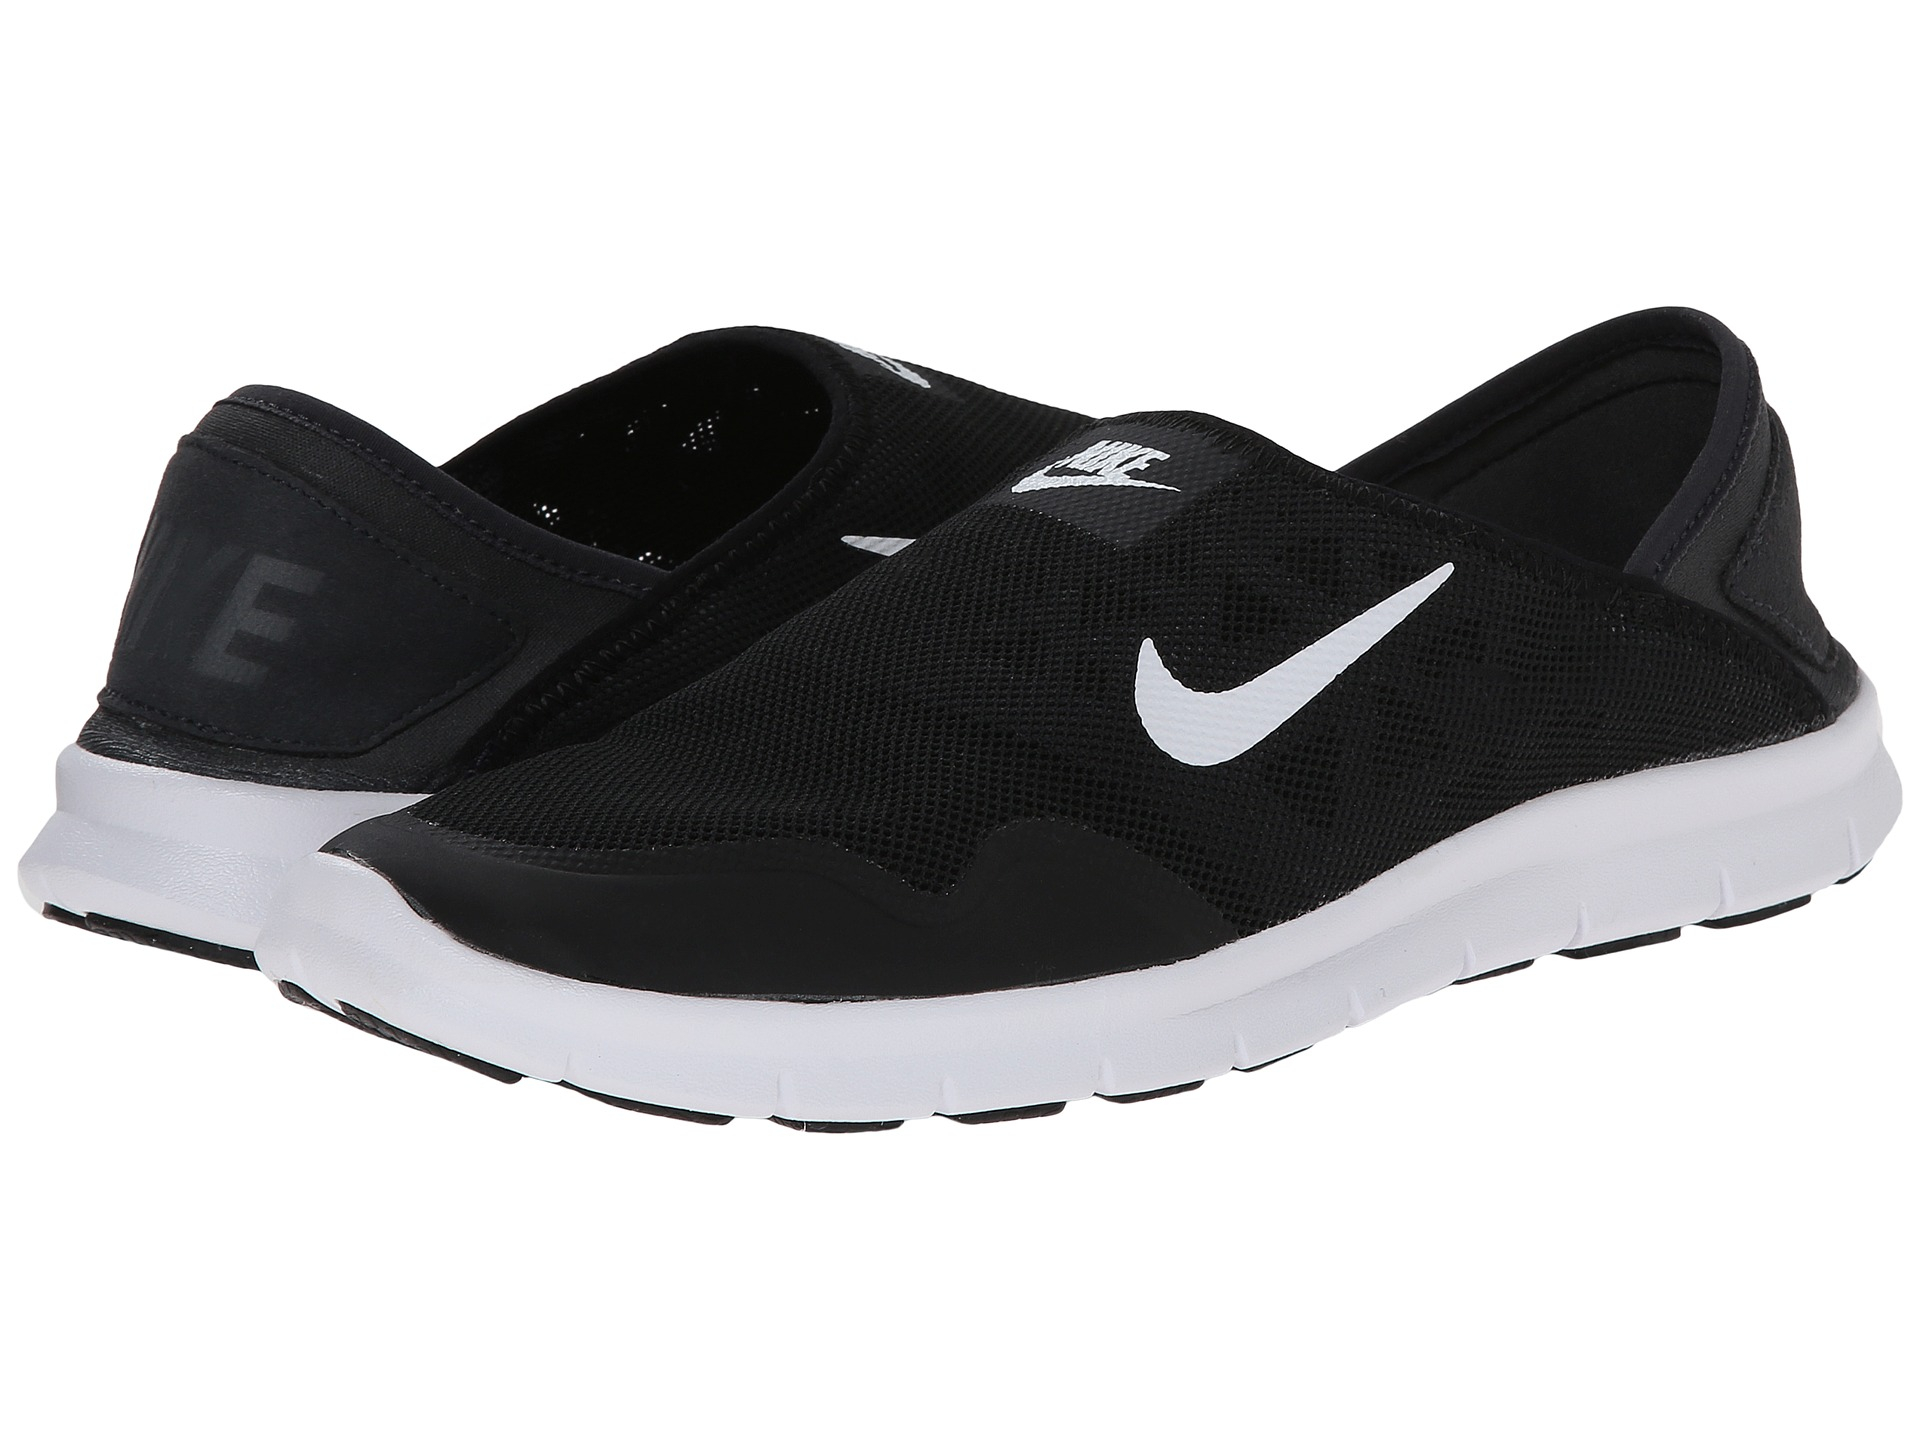 d4882ca4d Lyst - Nike Orive Lite Slip-on in Black